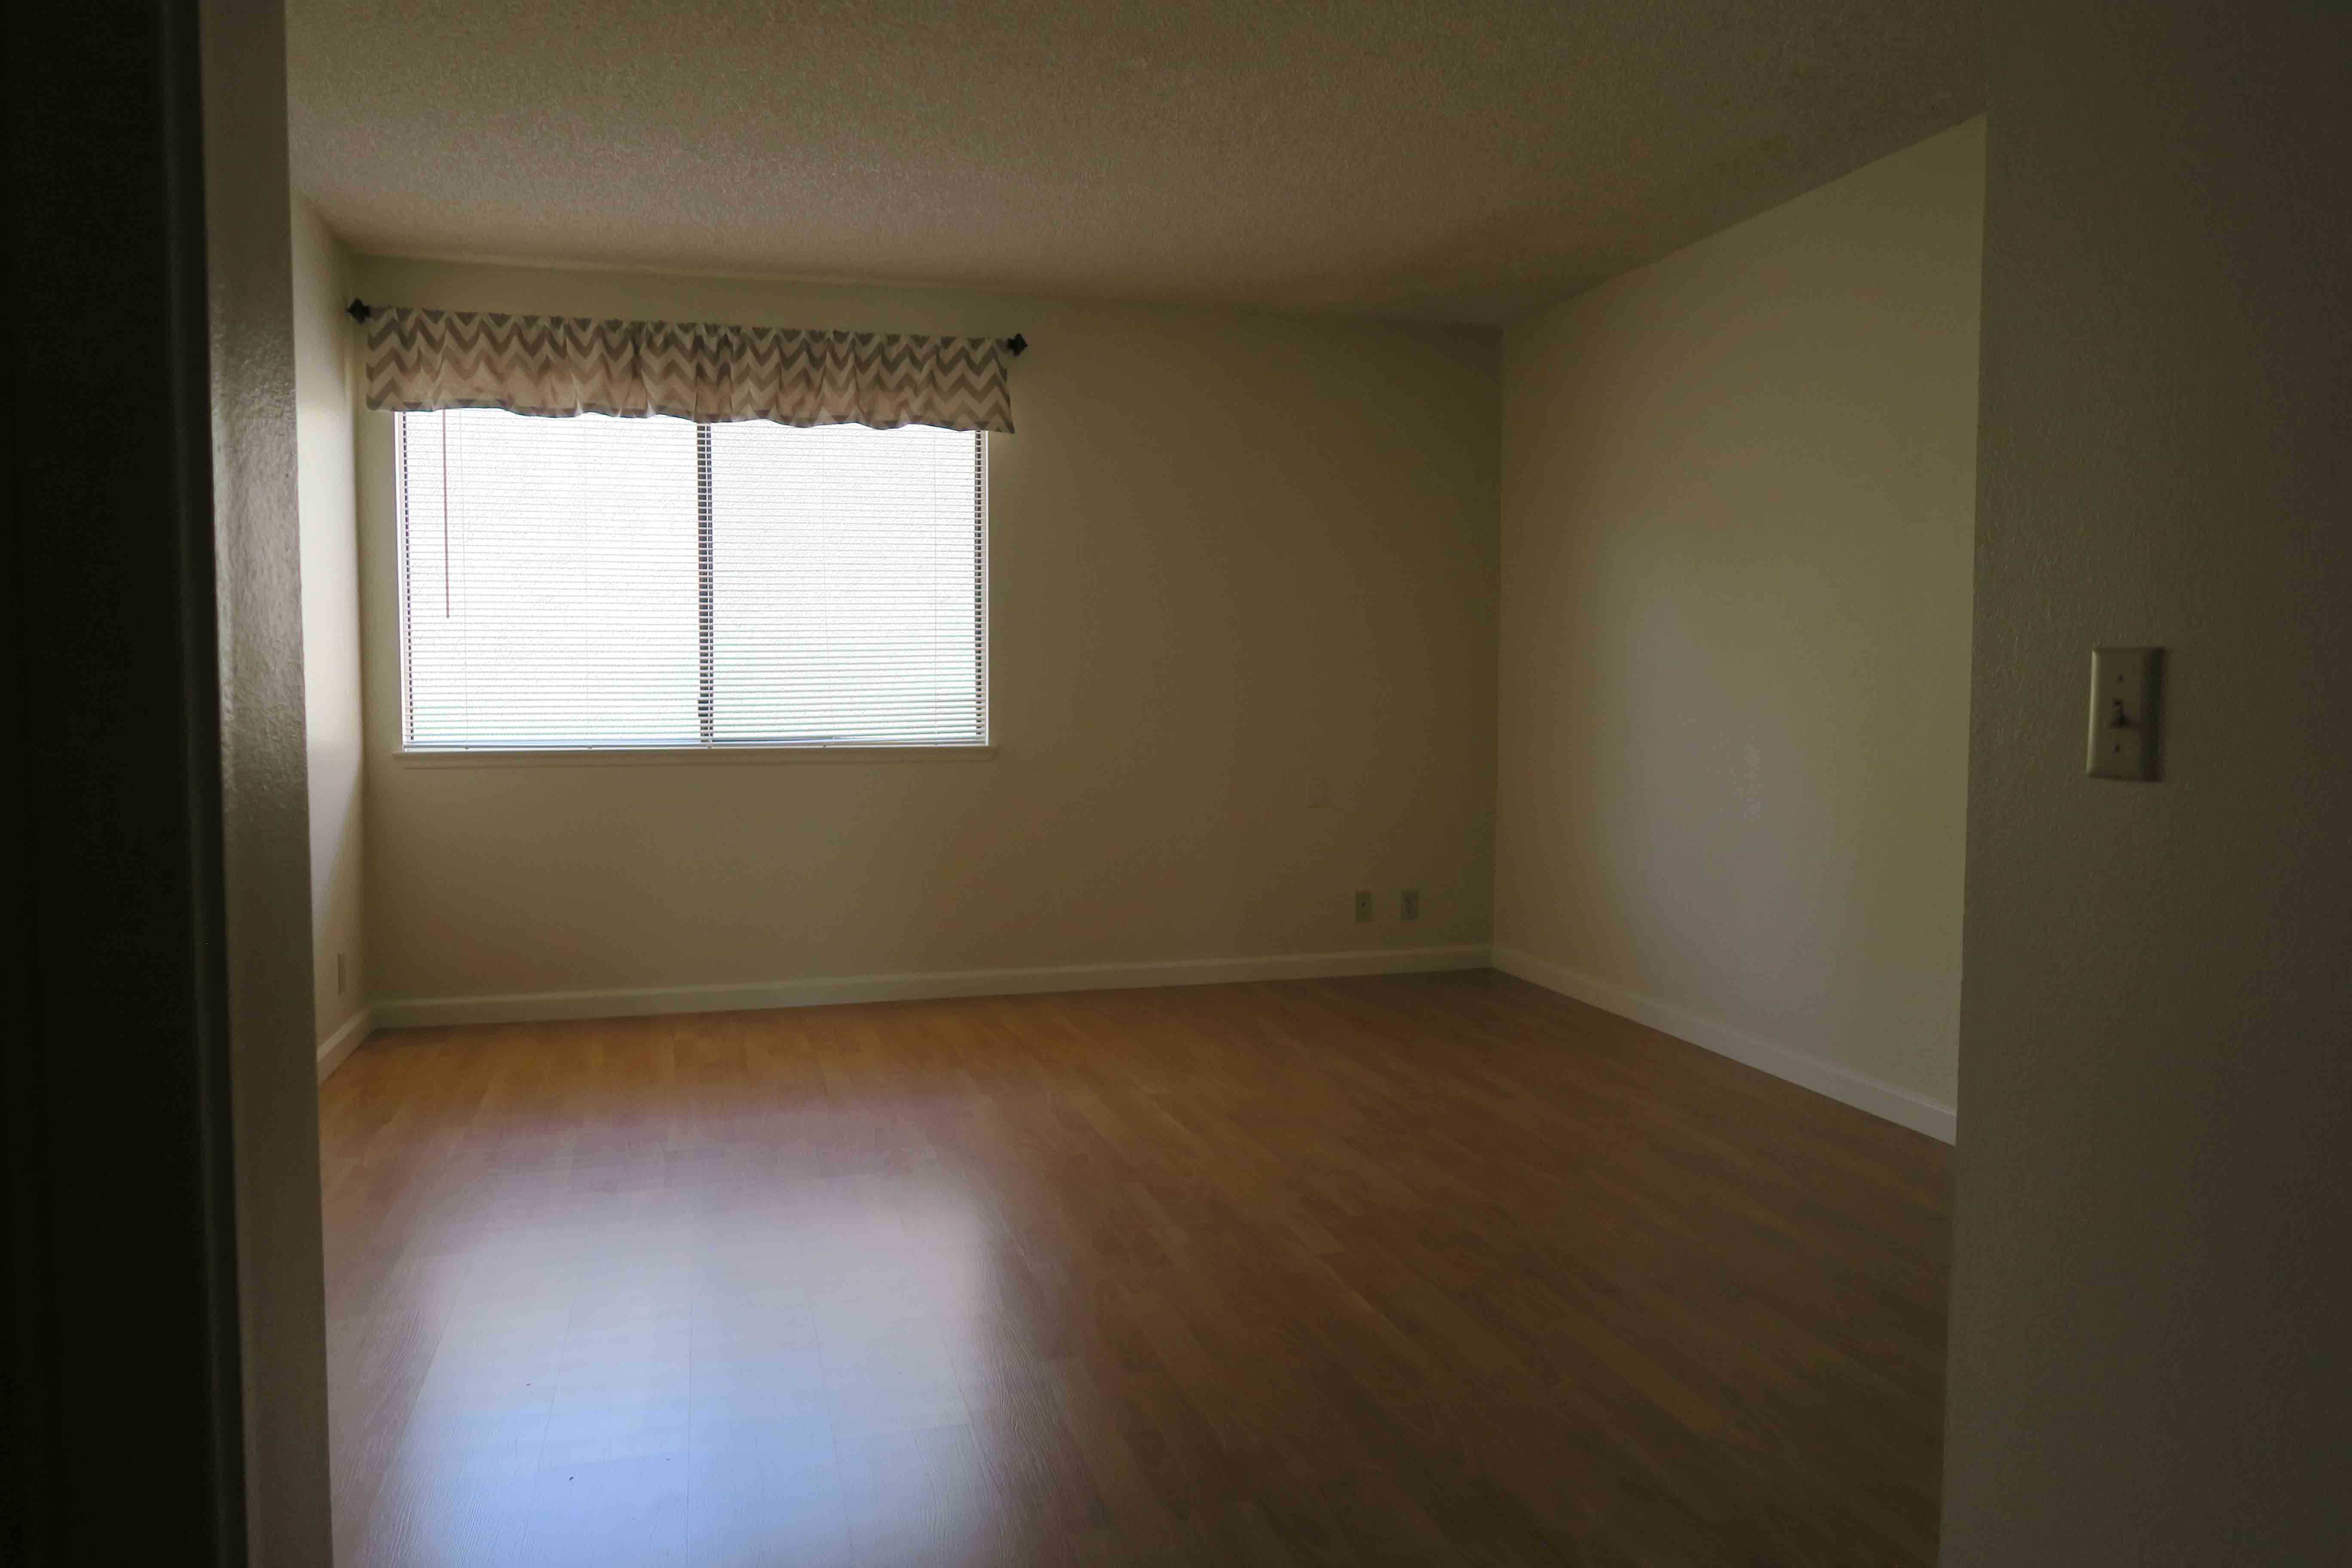 1841 Adelaide Ct, Oxnard CA 93035 Downstairs Bedroom 1